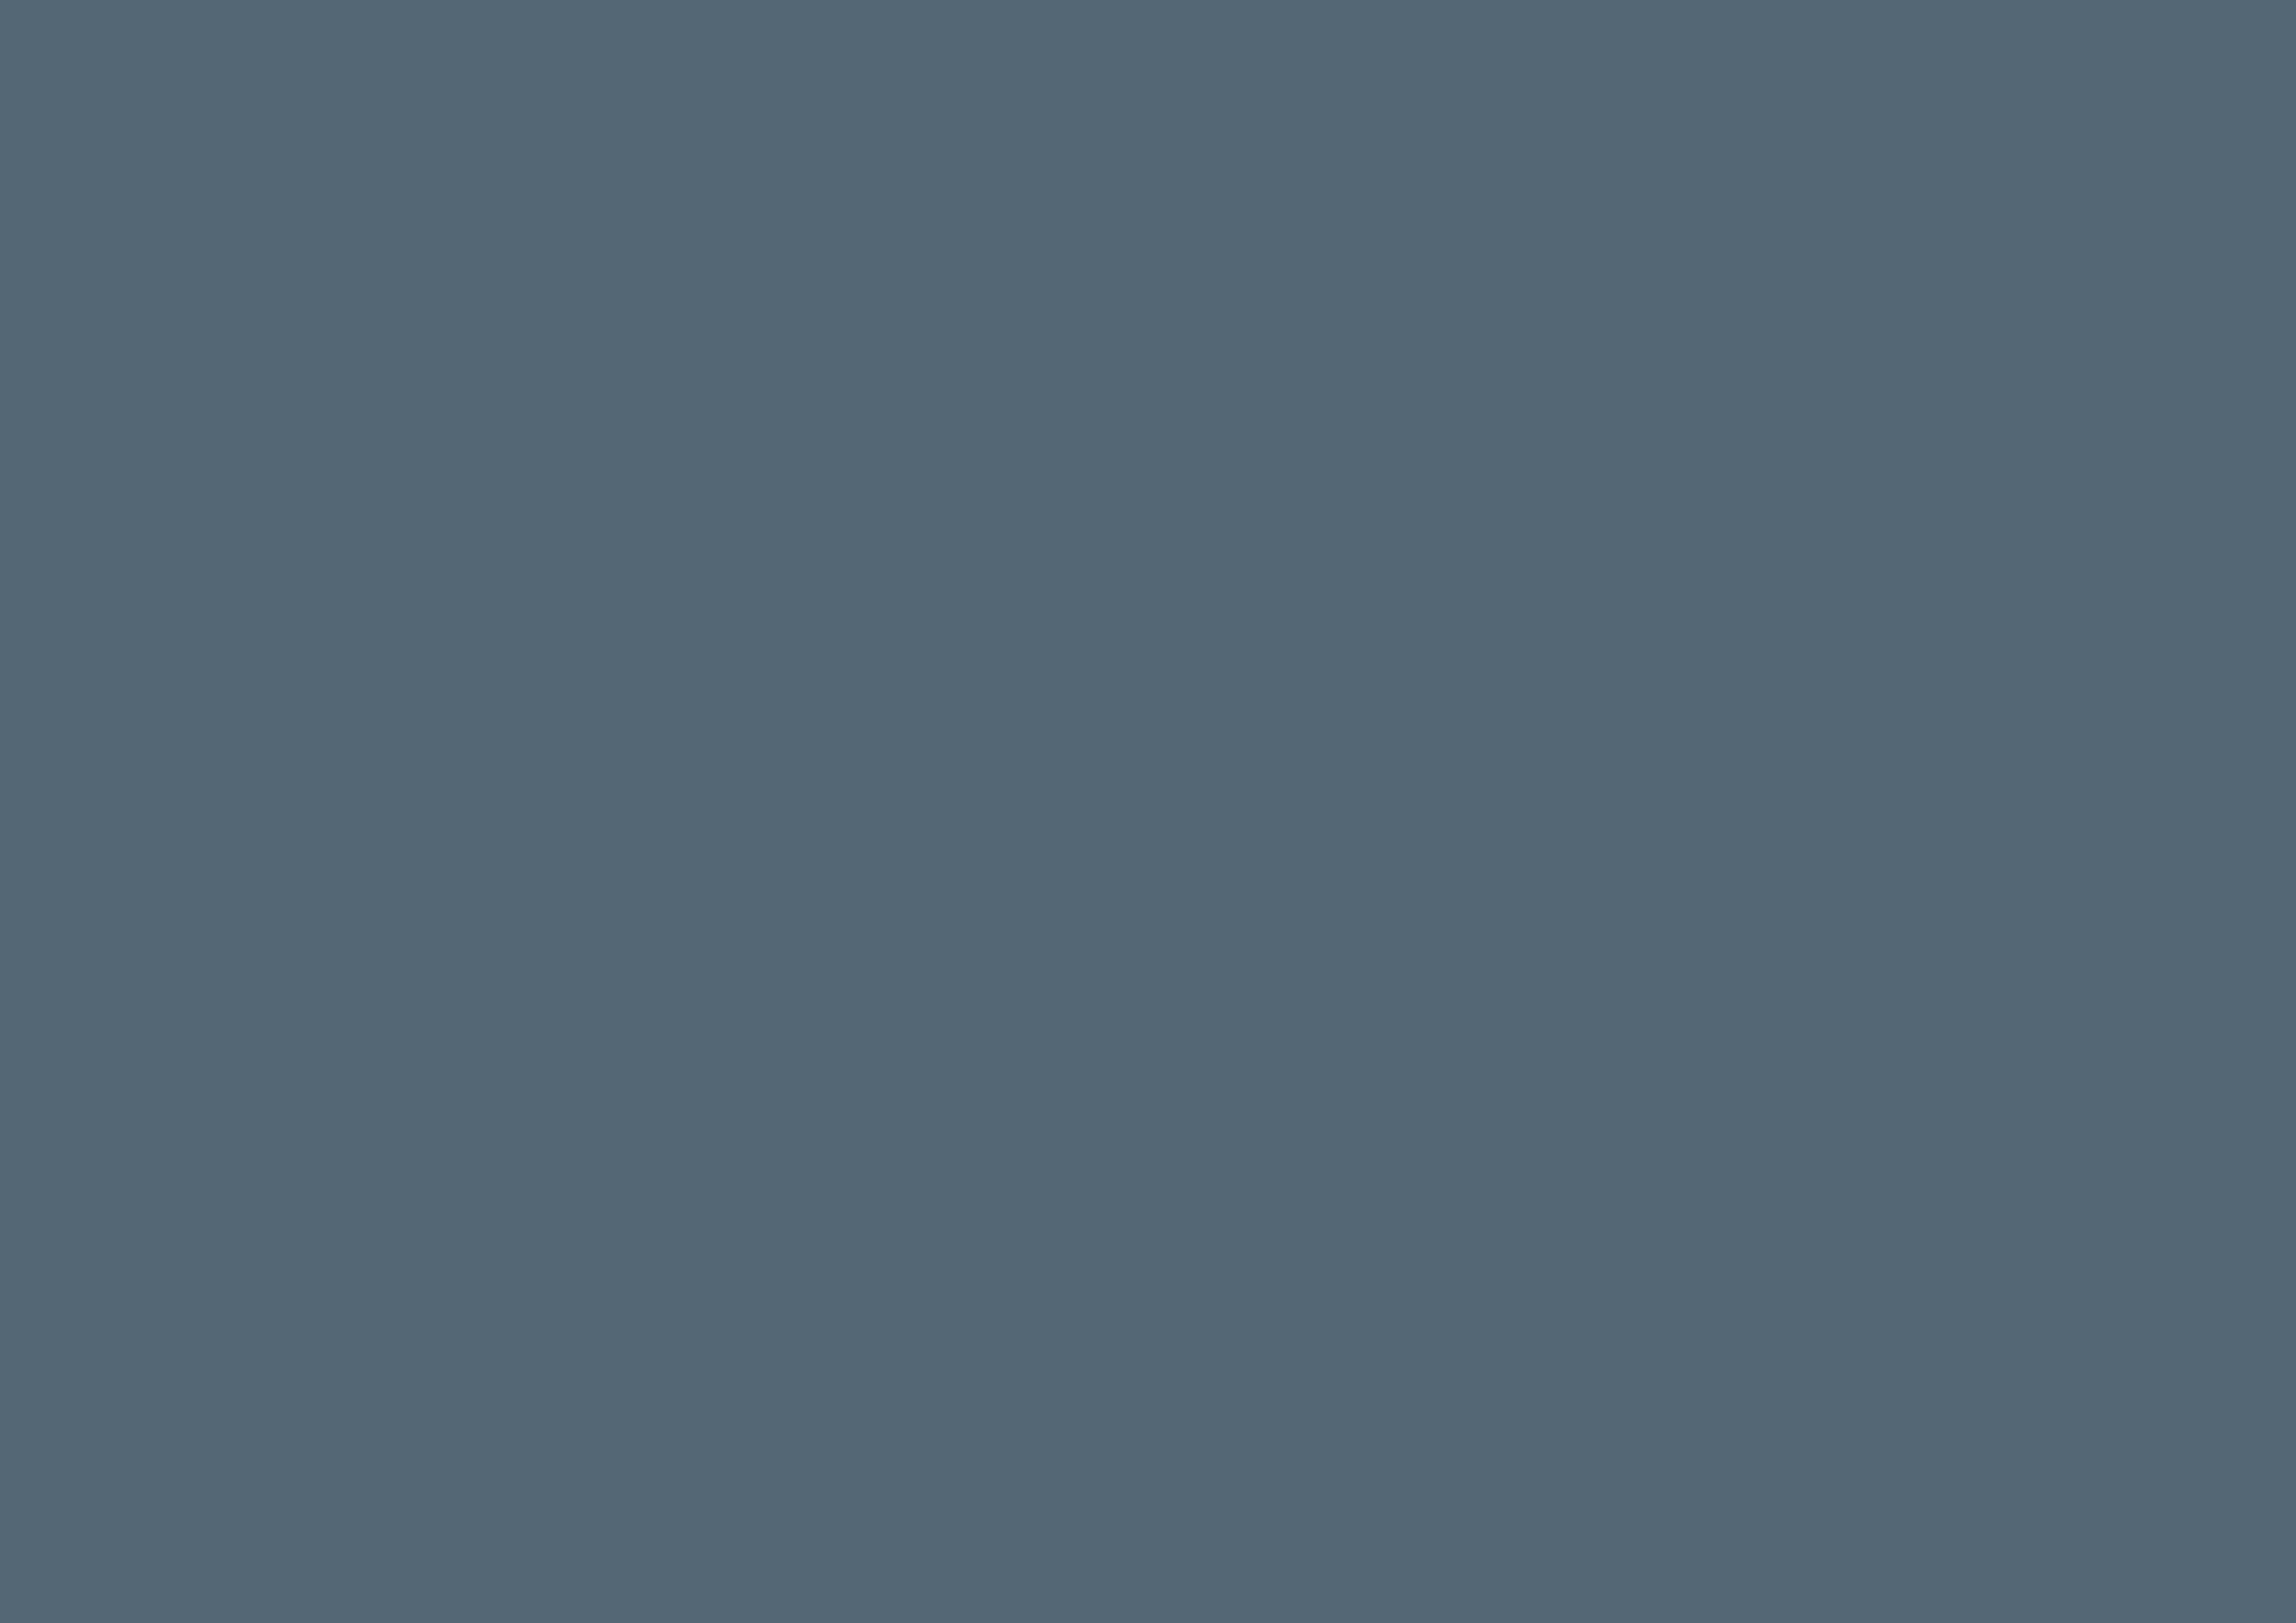 3508x2480 Cadet Solid Color Background